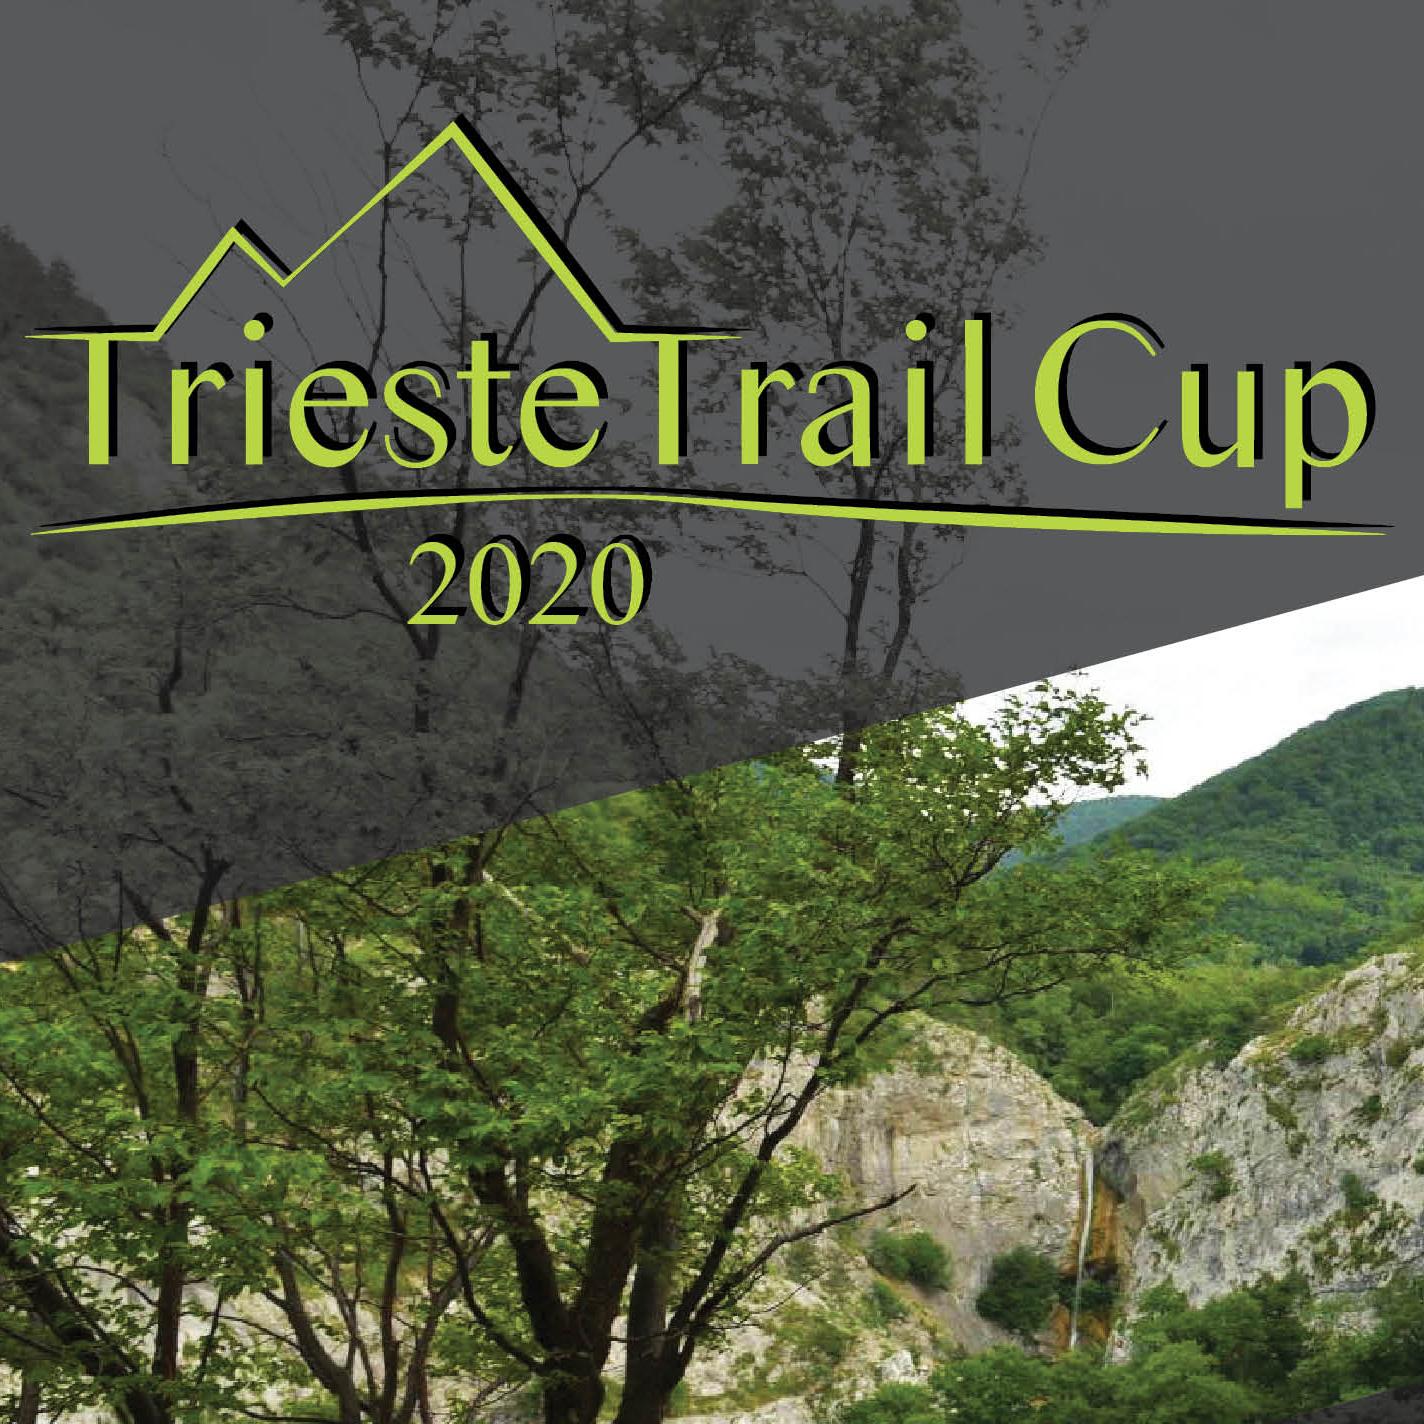 cim-TriesteTrail-Cup-1-quadrata